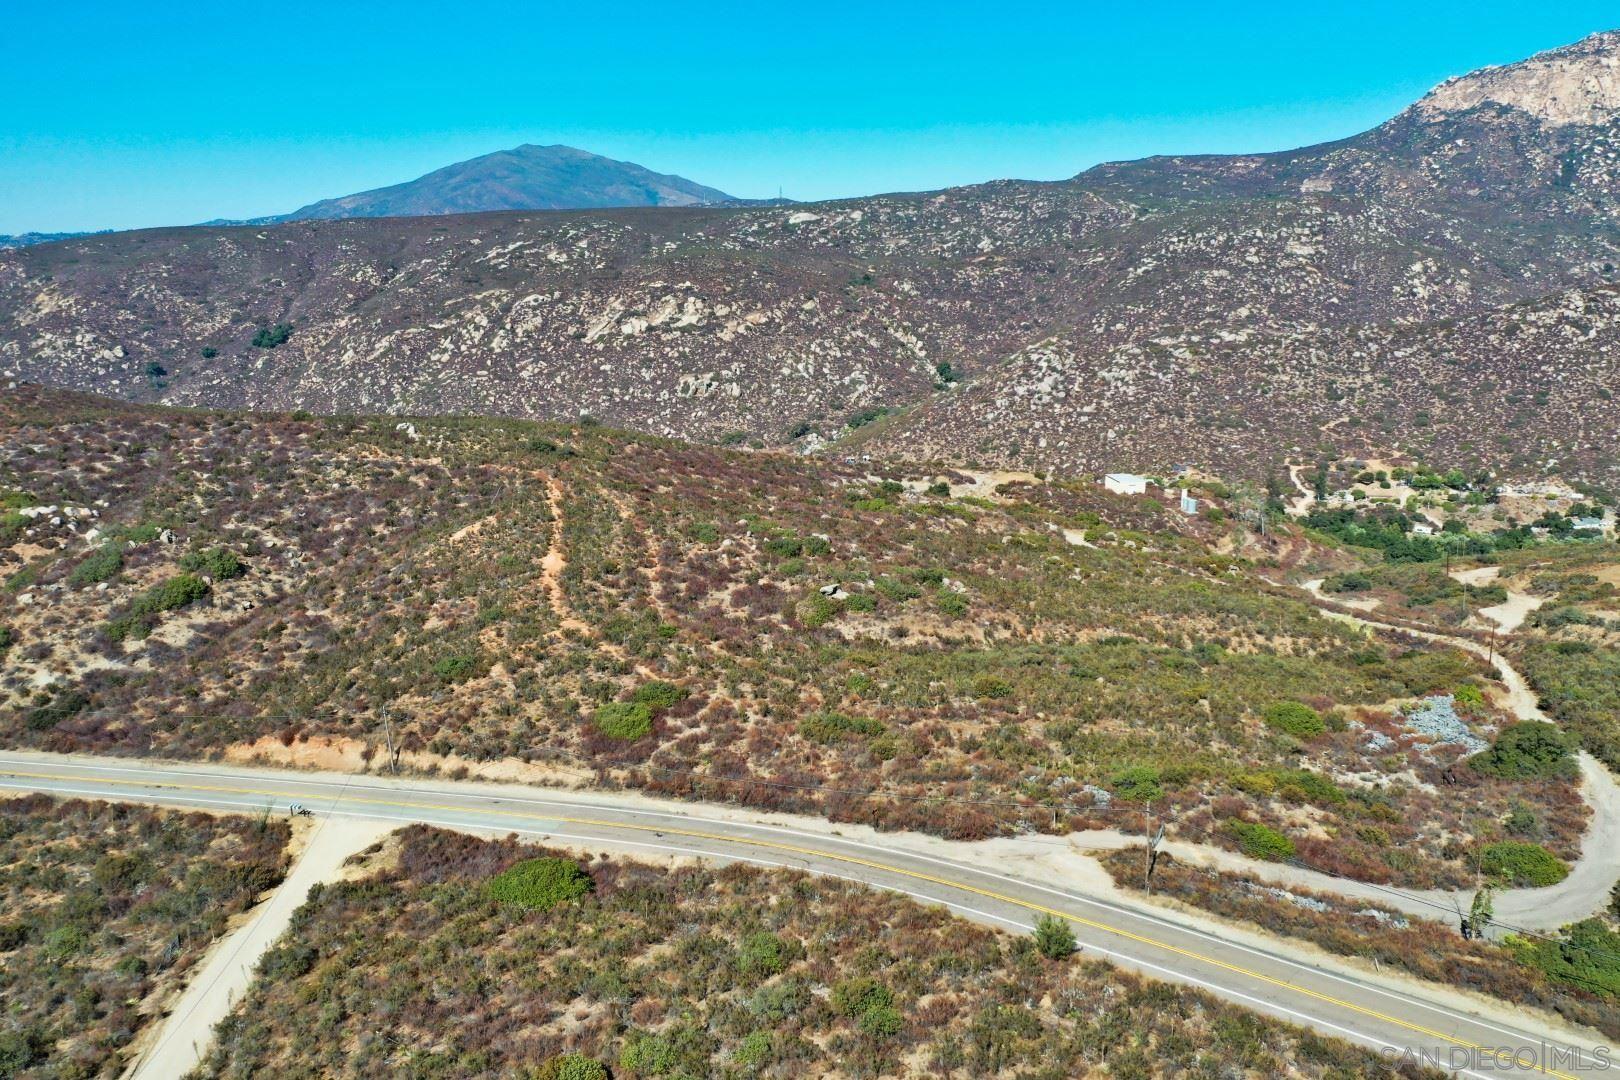 Photo of Japatul Rd, Alpine, CA 91901 (MLS # 200049916)